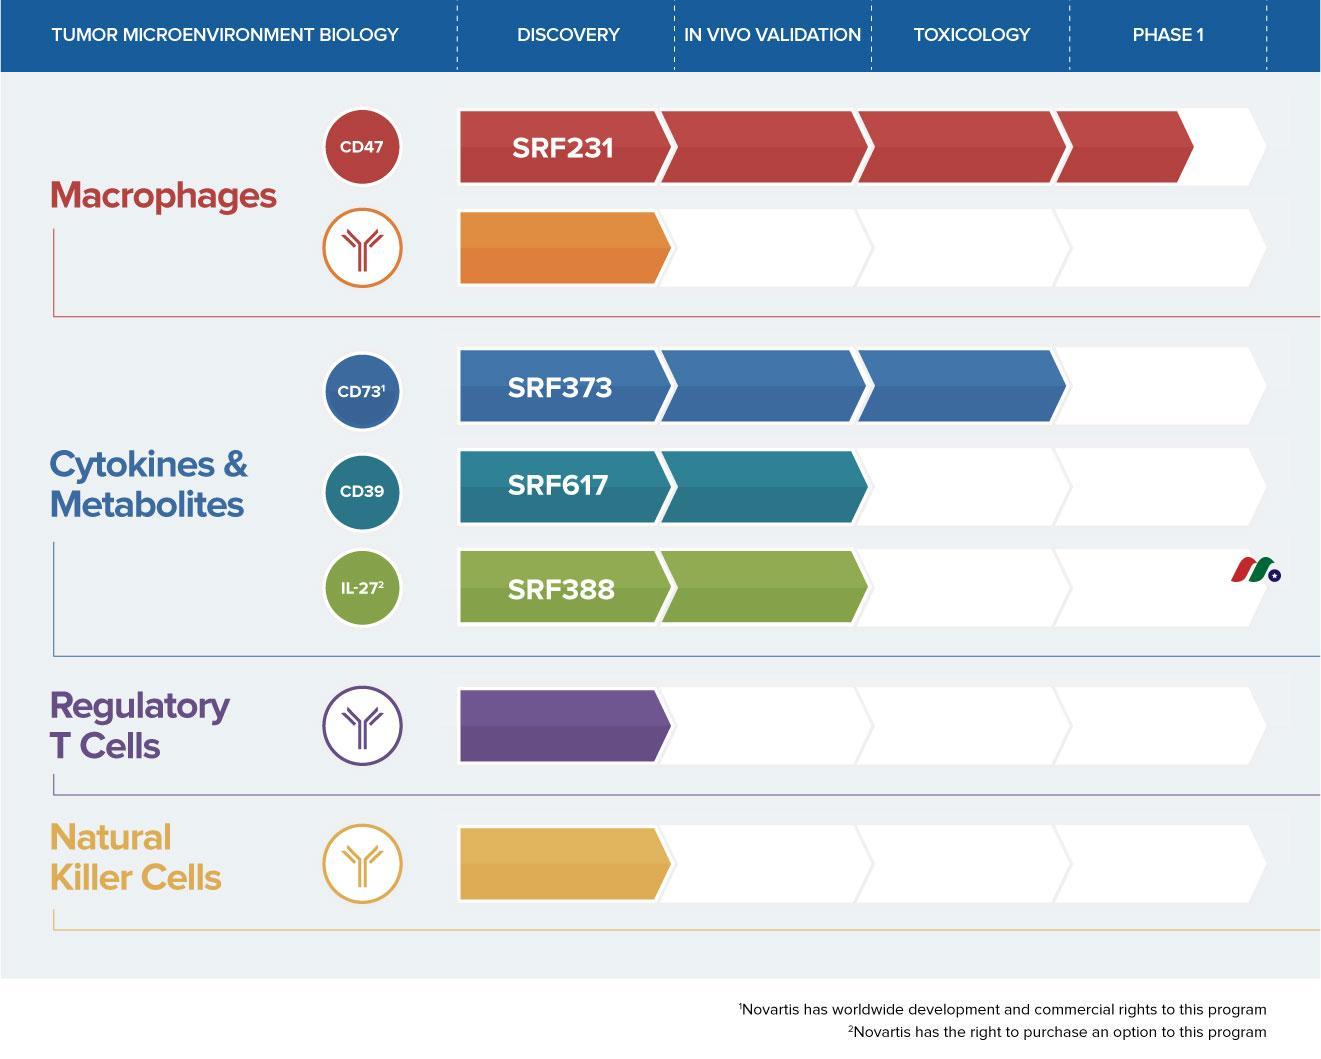 免疫肿瘤学公司:Surface Oncology, Inc.(SURF)